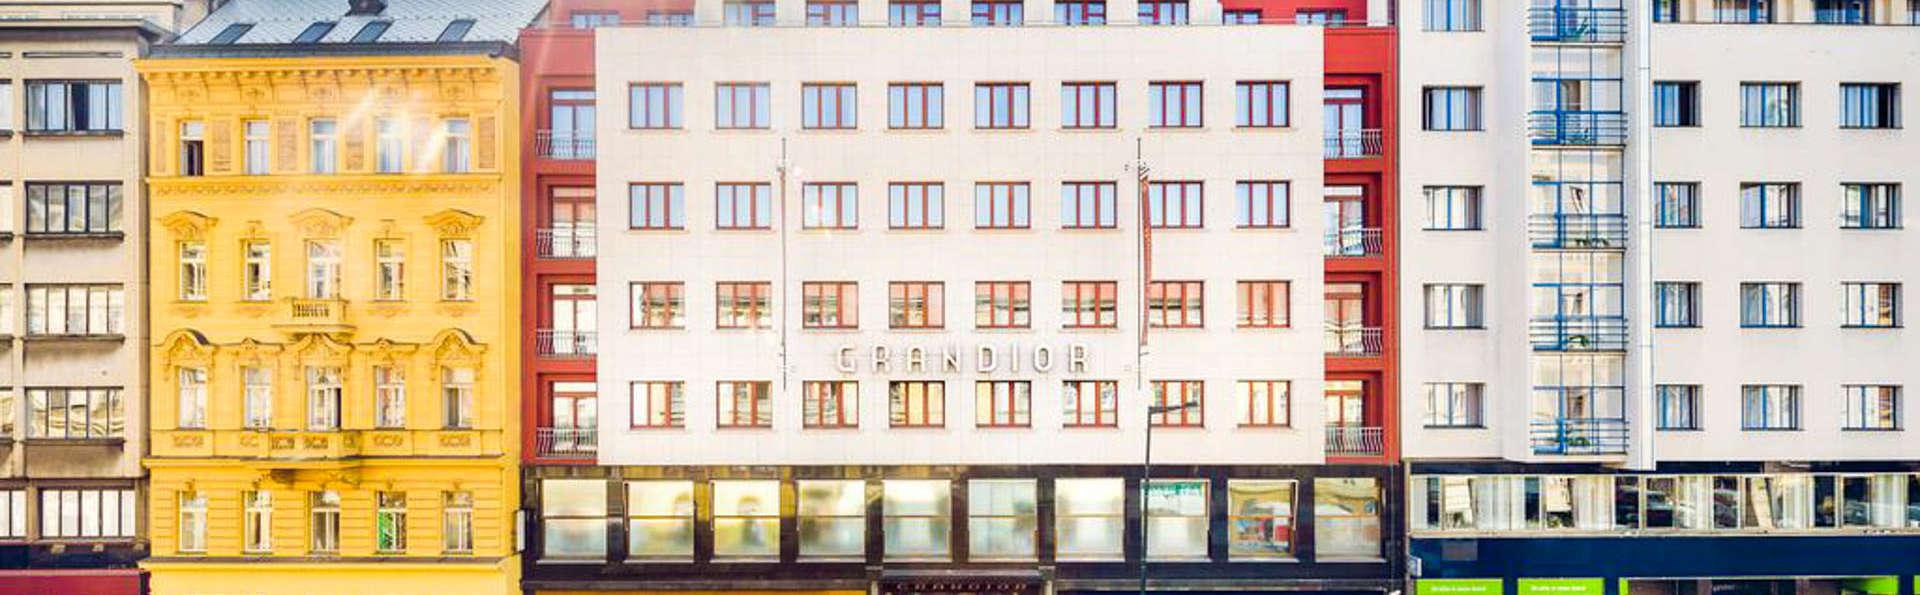 Grandior Hotel Prague - EDIT_FRONT.jpg